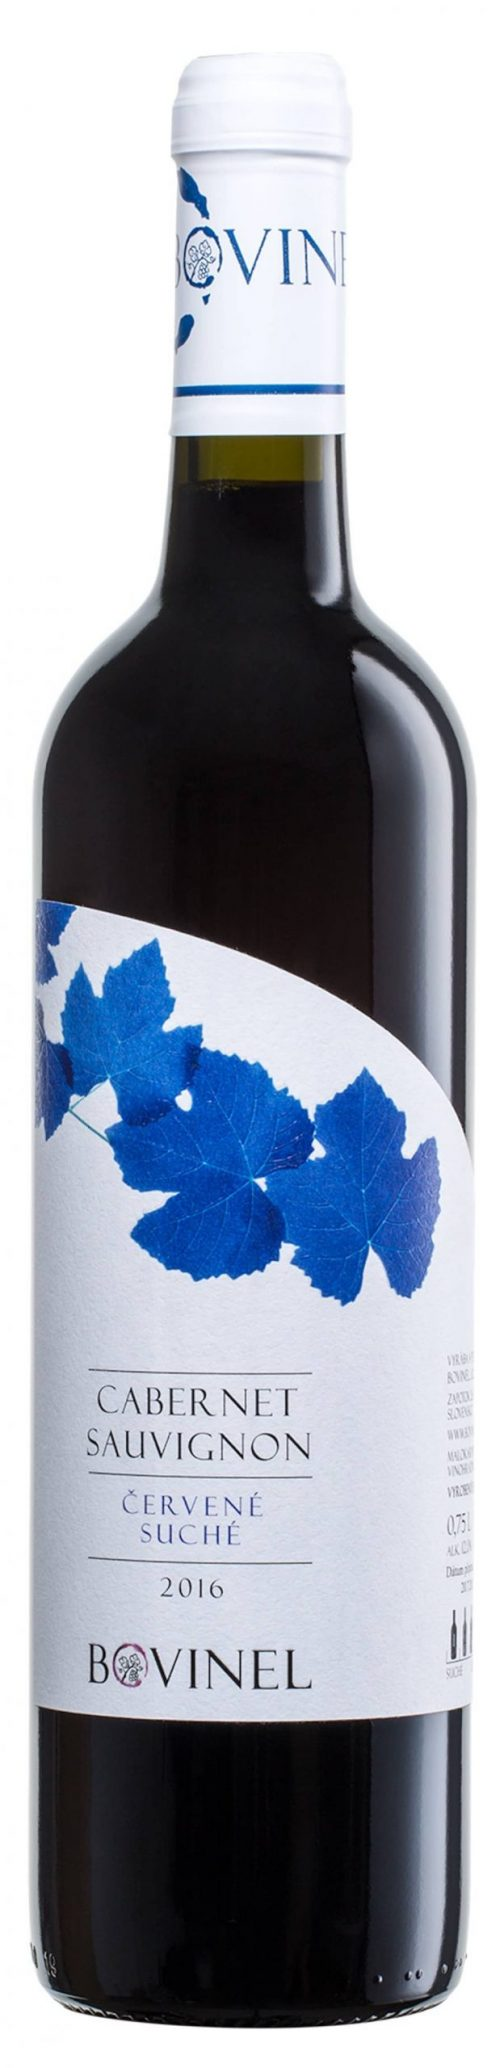 Víno Bovinel - Cabernet Savignon 2016 suché